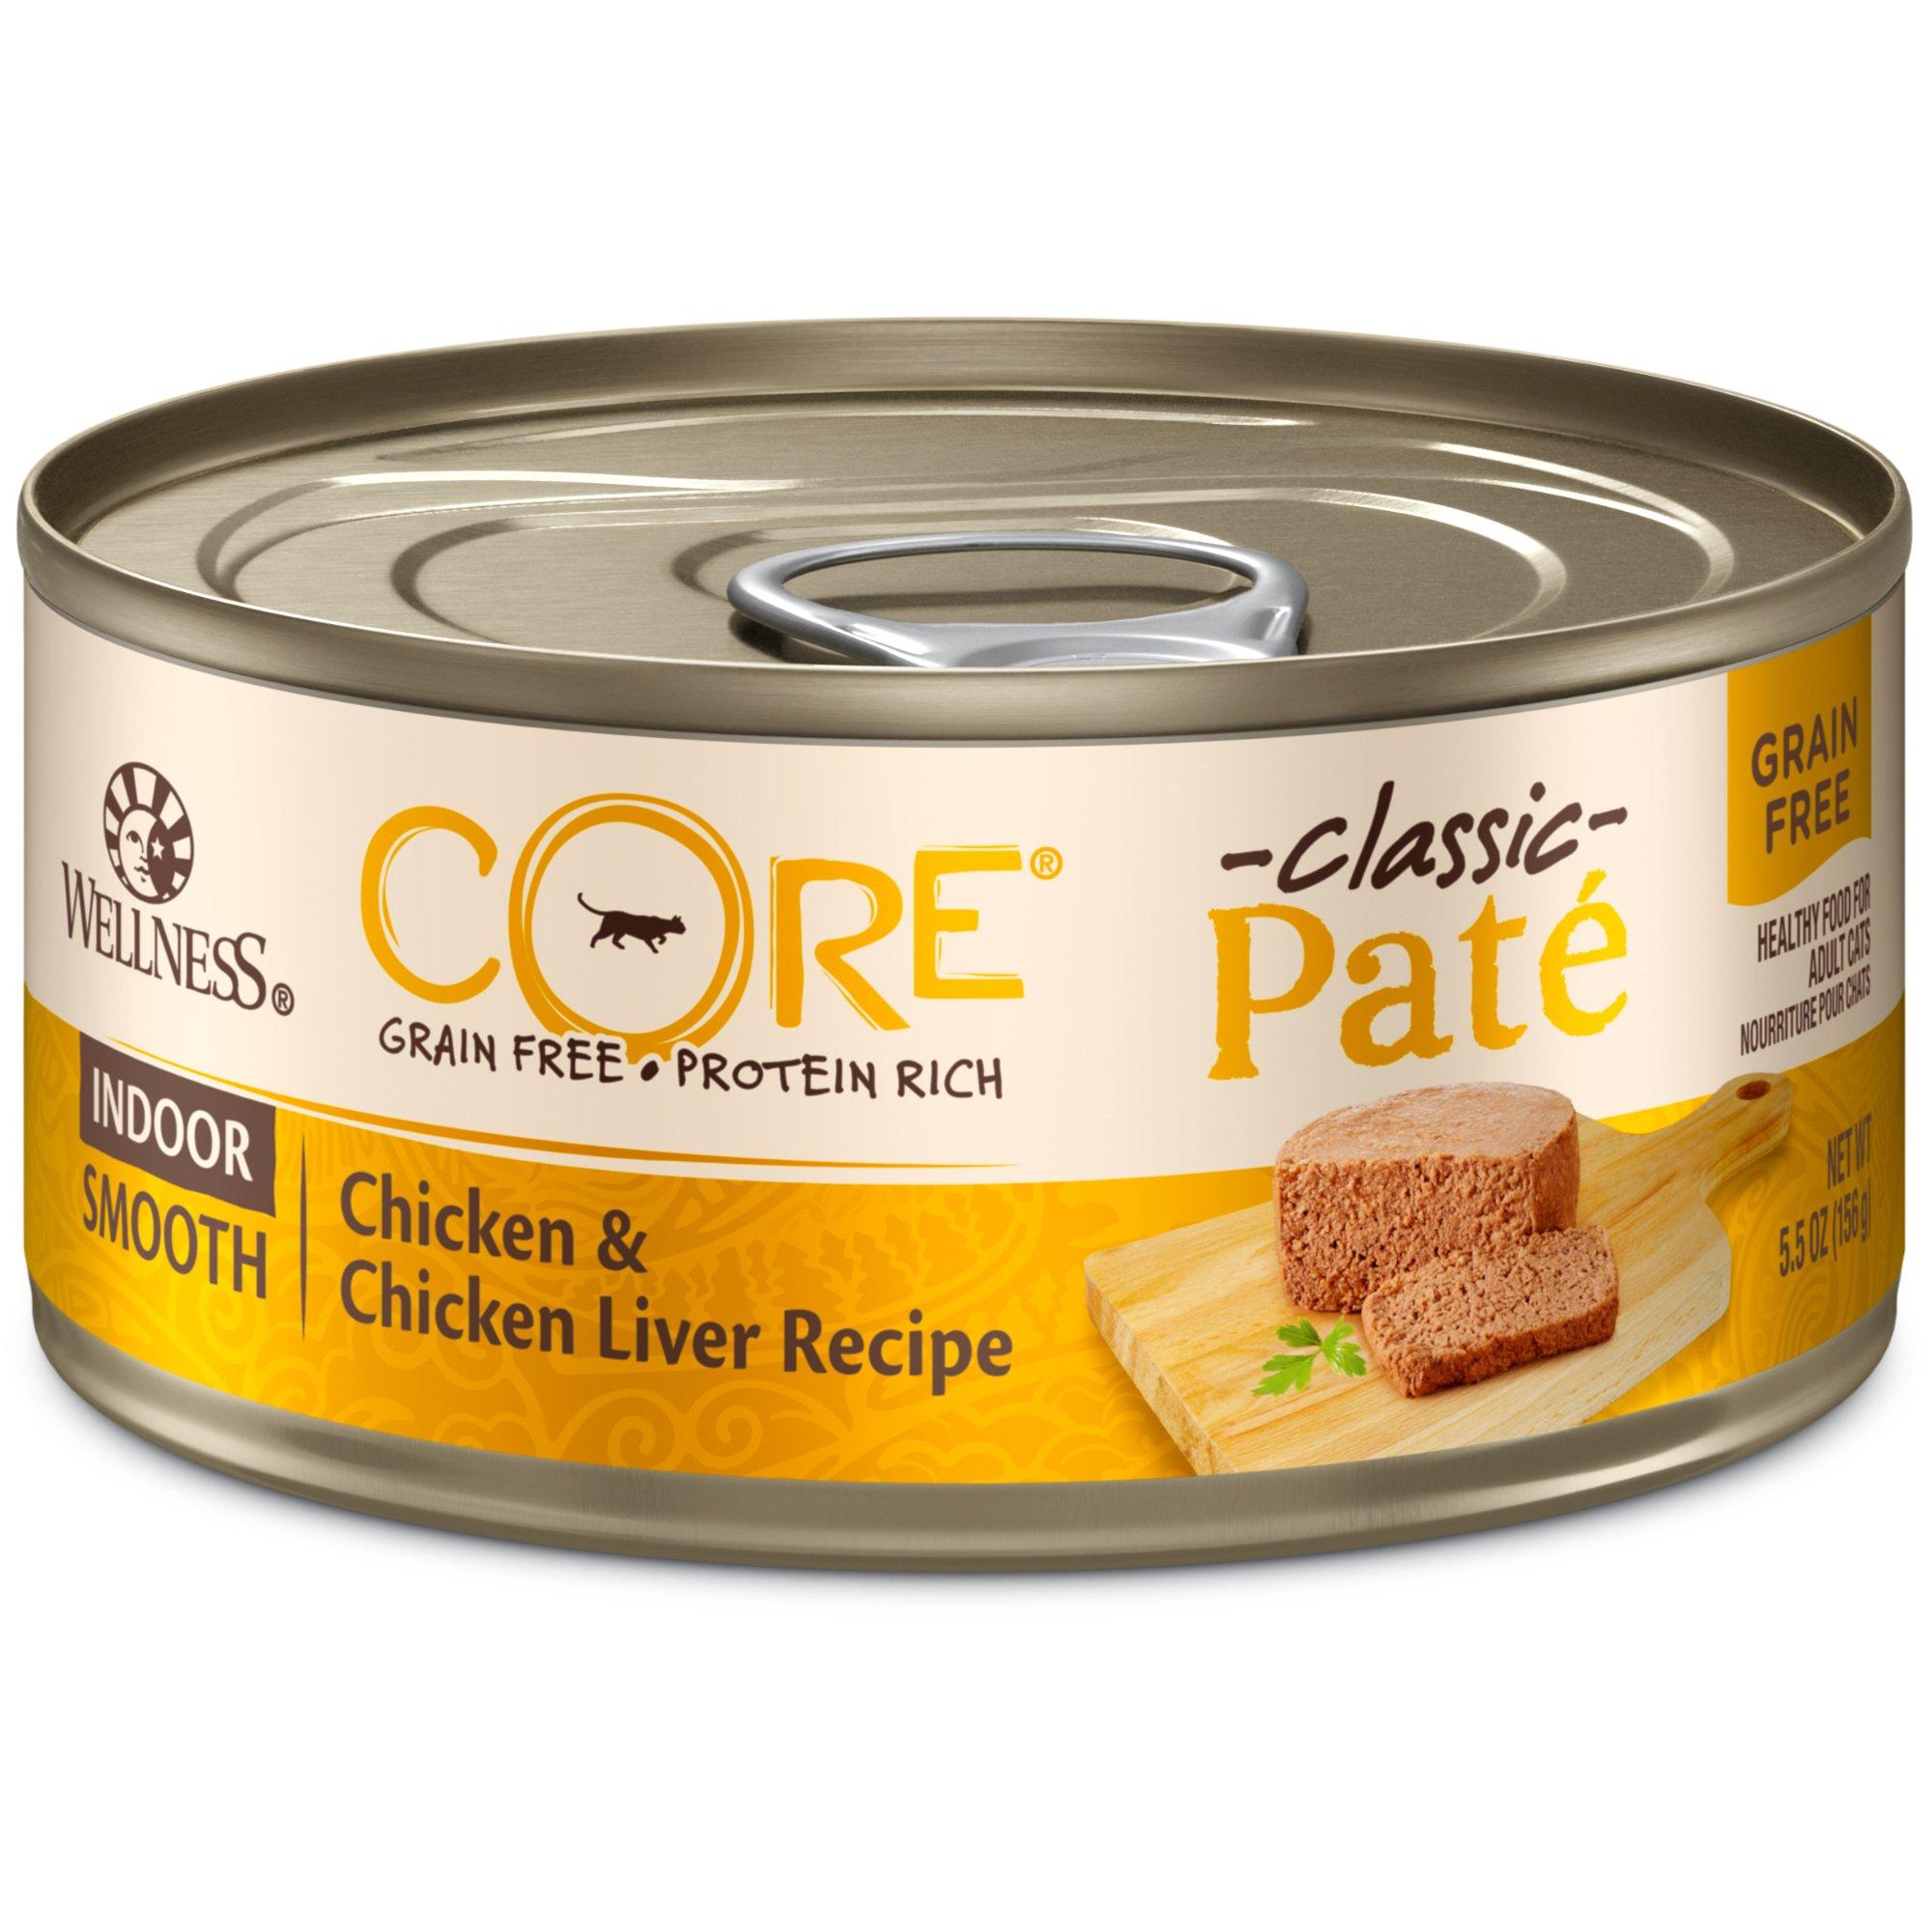 Wellness Grain Free Canned Cat Food